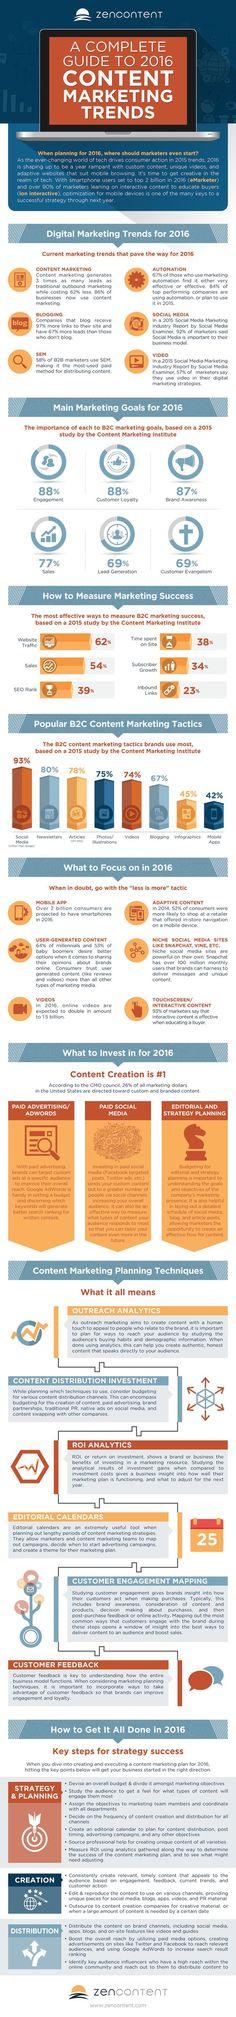 #DigitalMediaMarketing  2016 #ContentMarketing Trends,   Goals, Analytics…